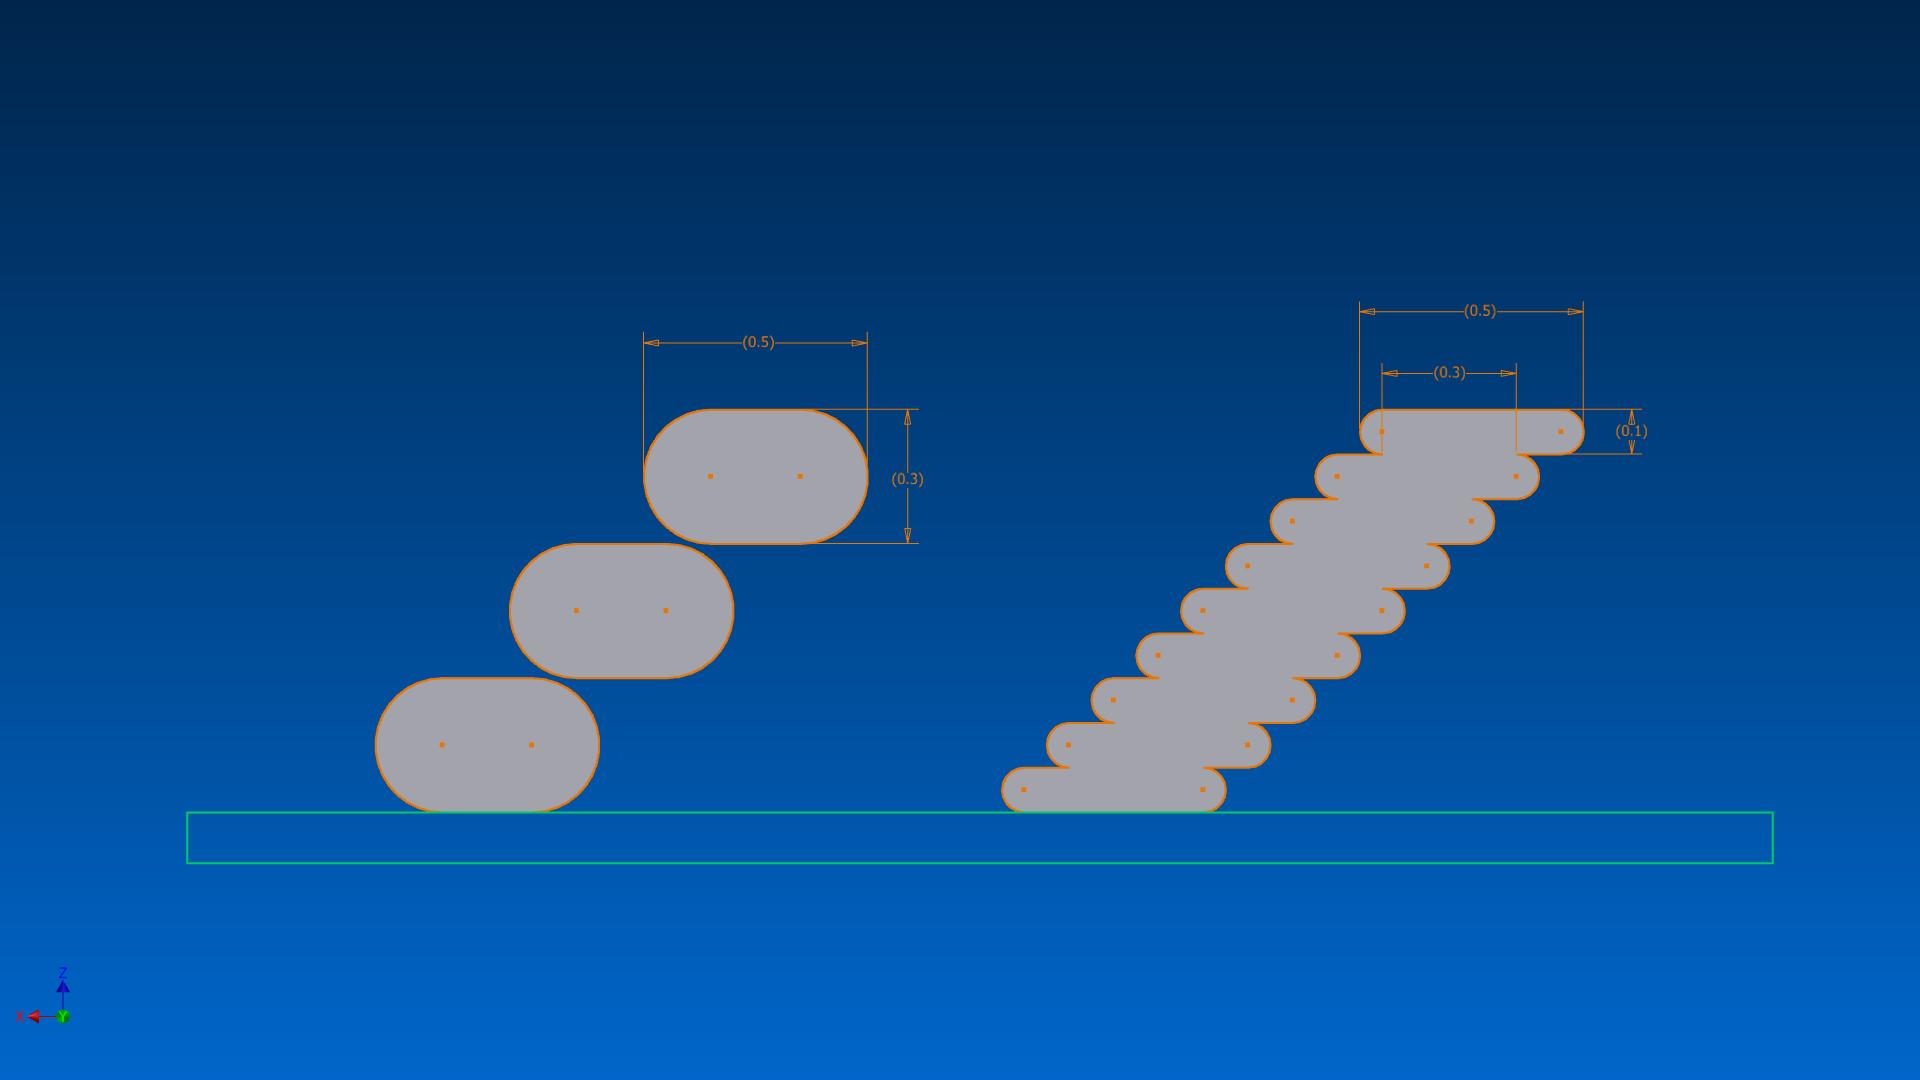 3D Printed Overhang VS Layerheight